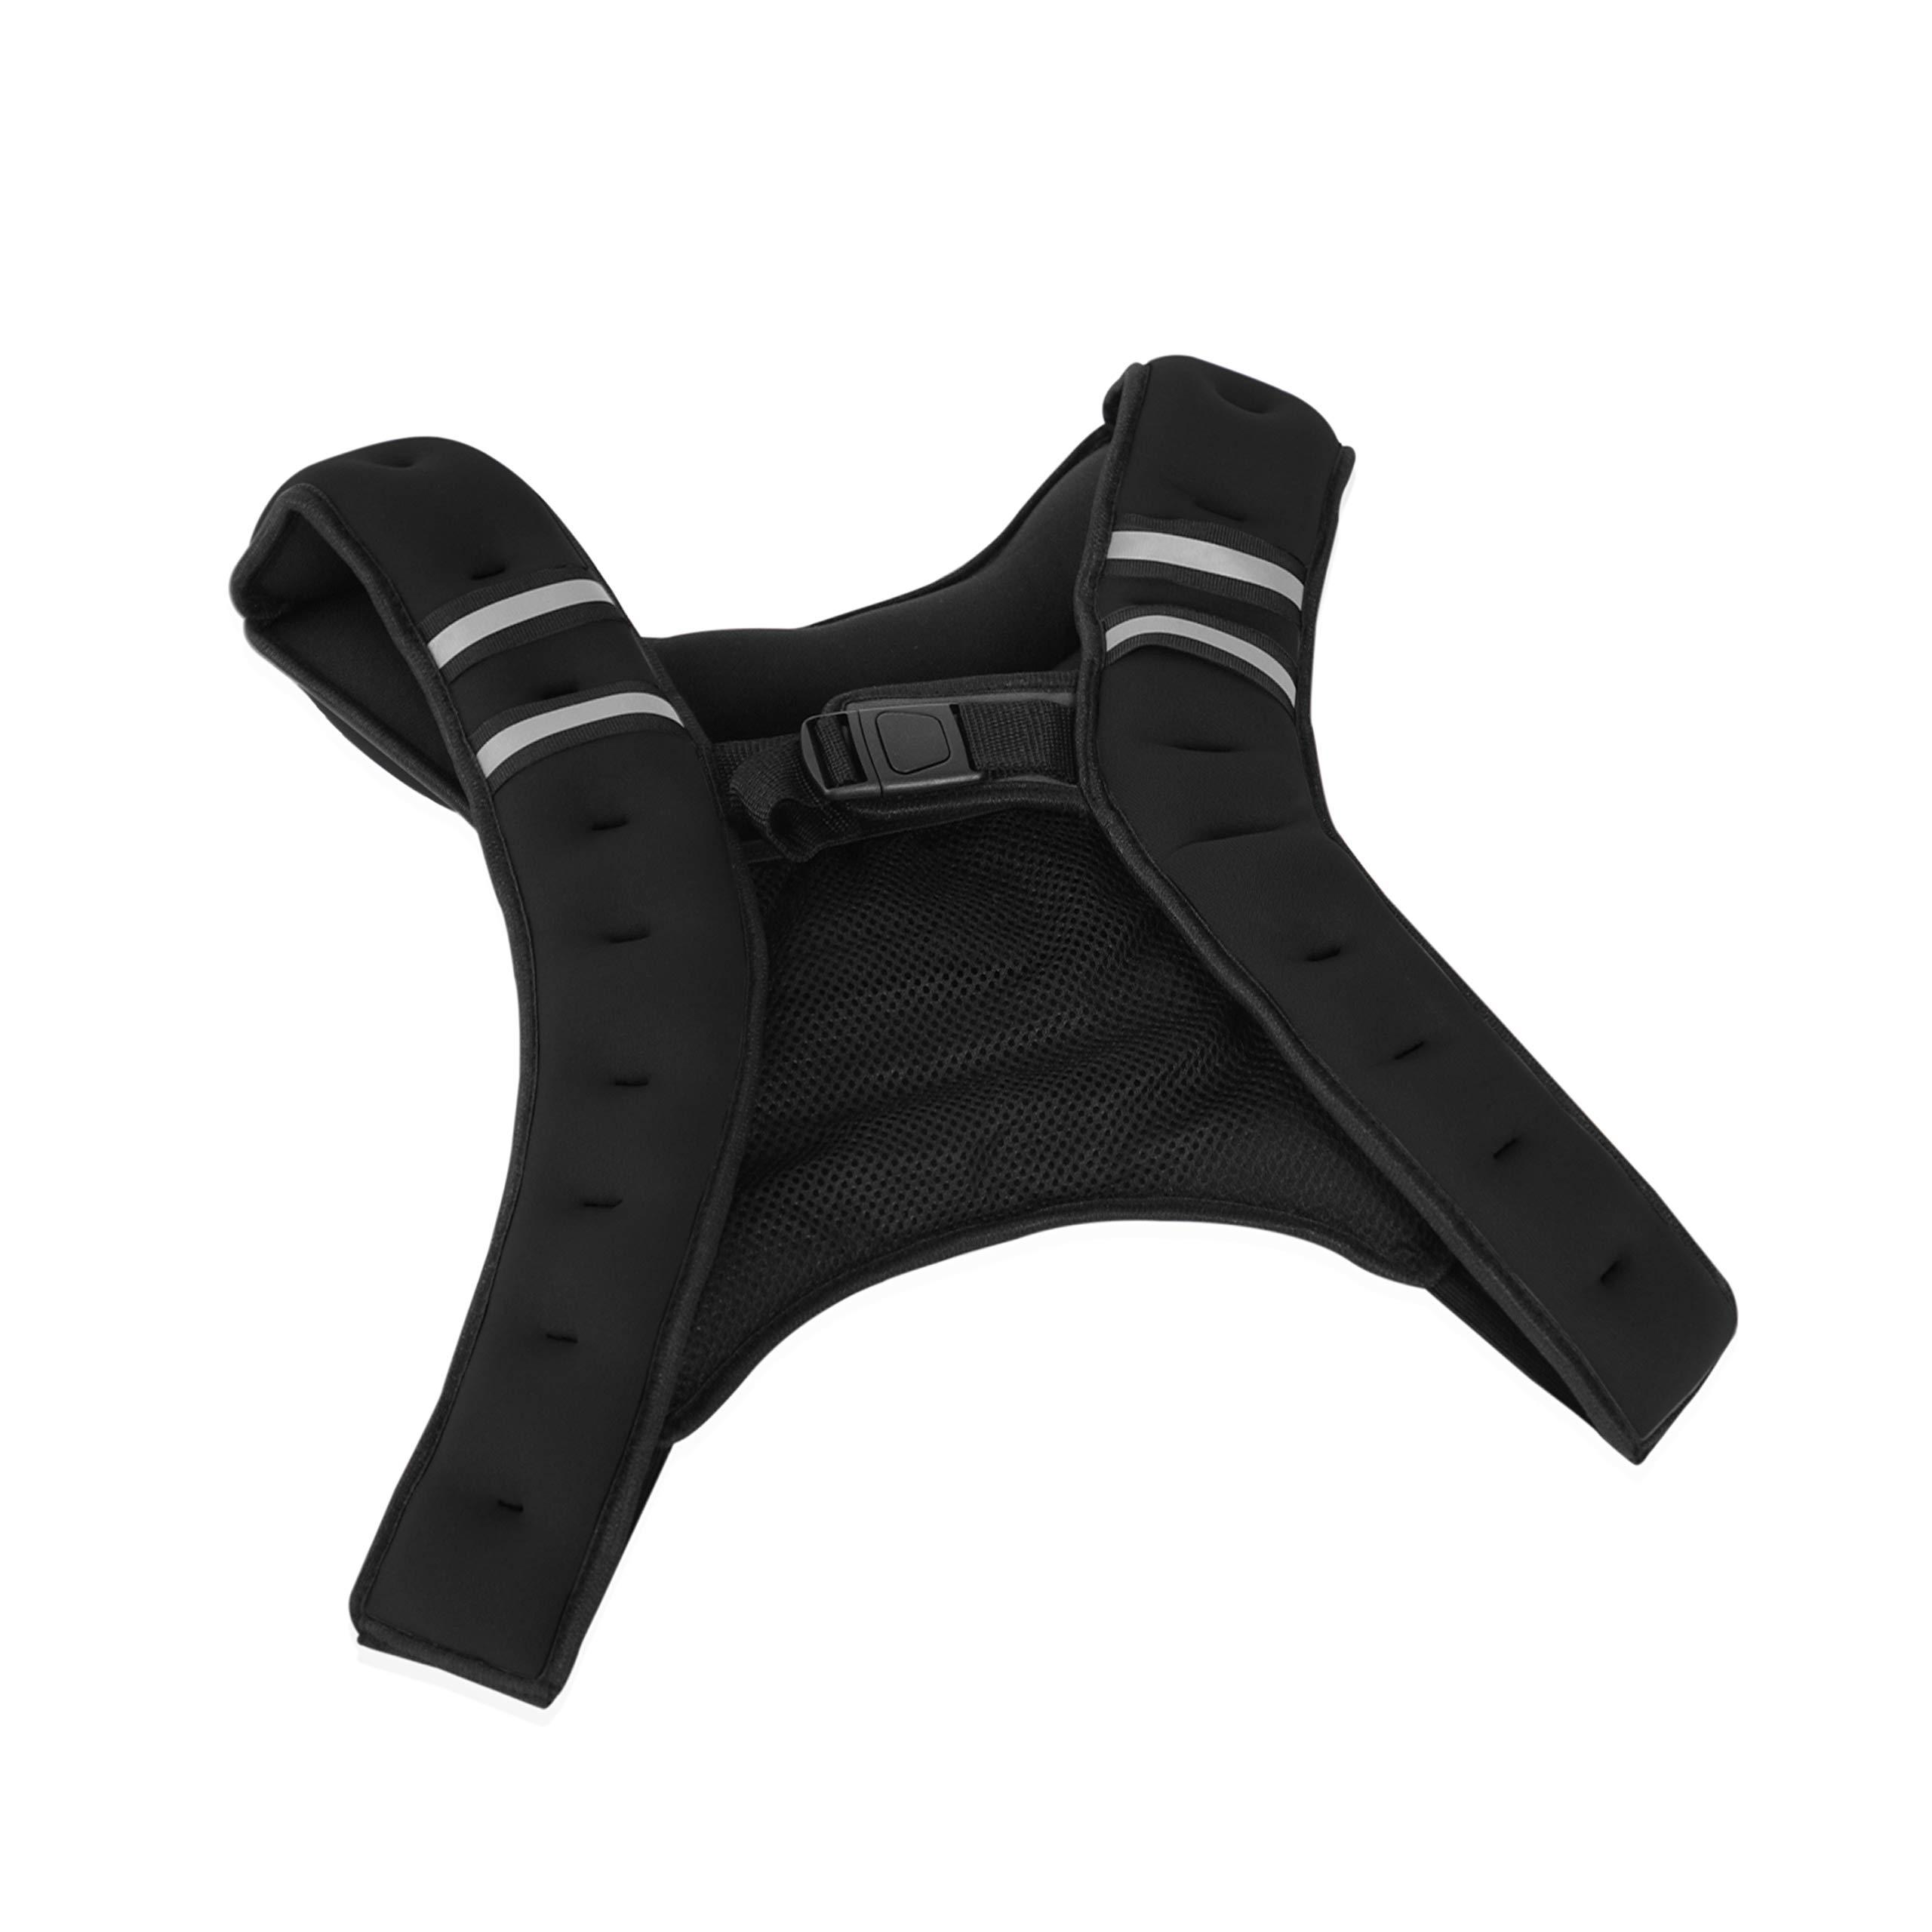 Tone Fitness HHWV-TN012B Black Weighted Vest, 12 Lbs, Black